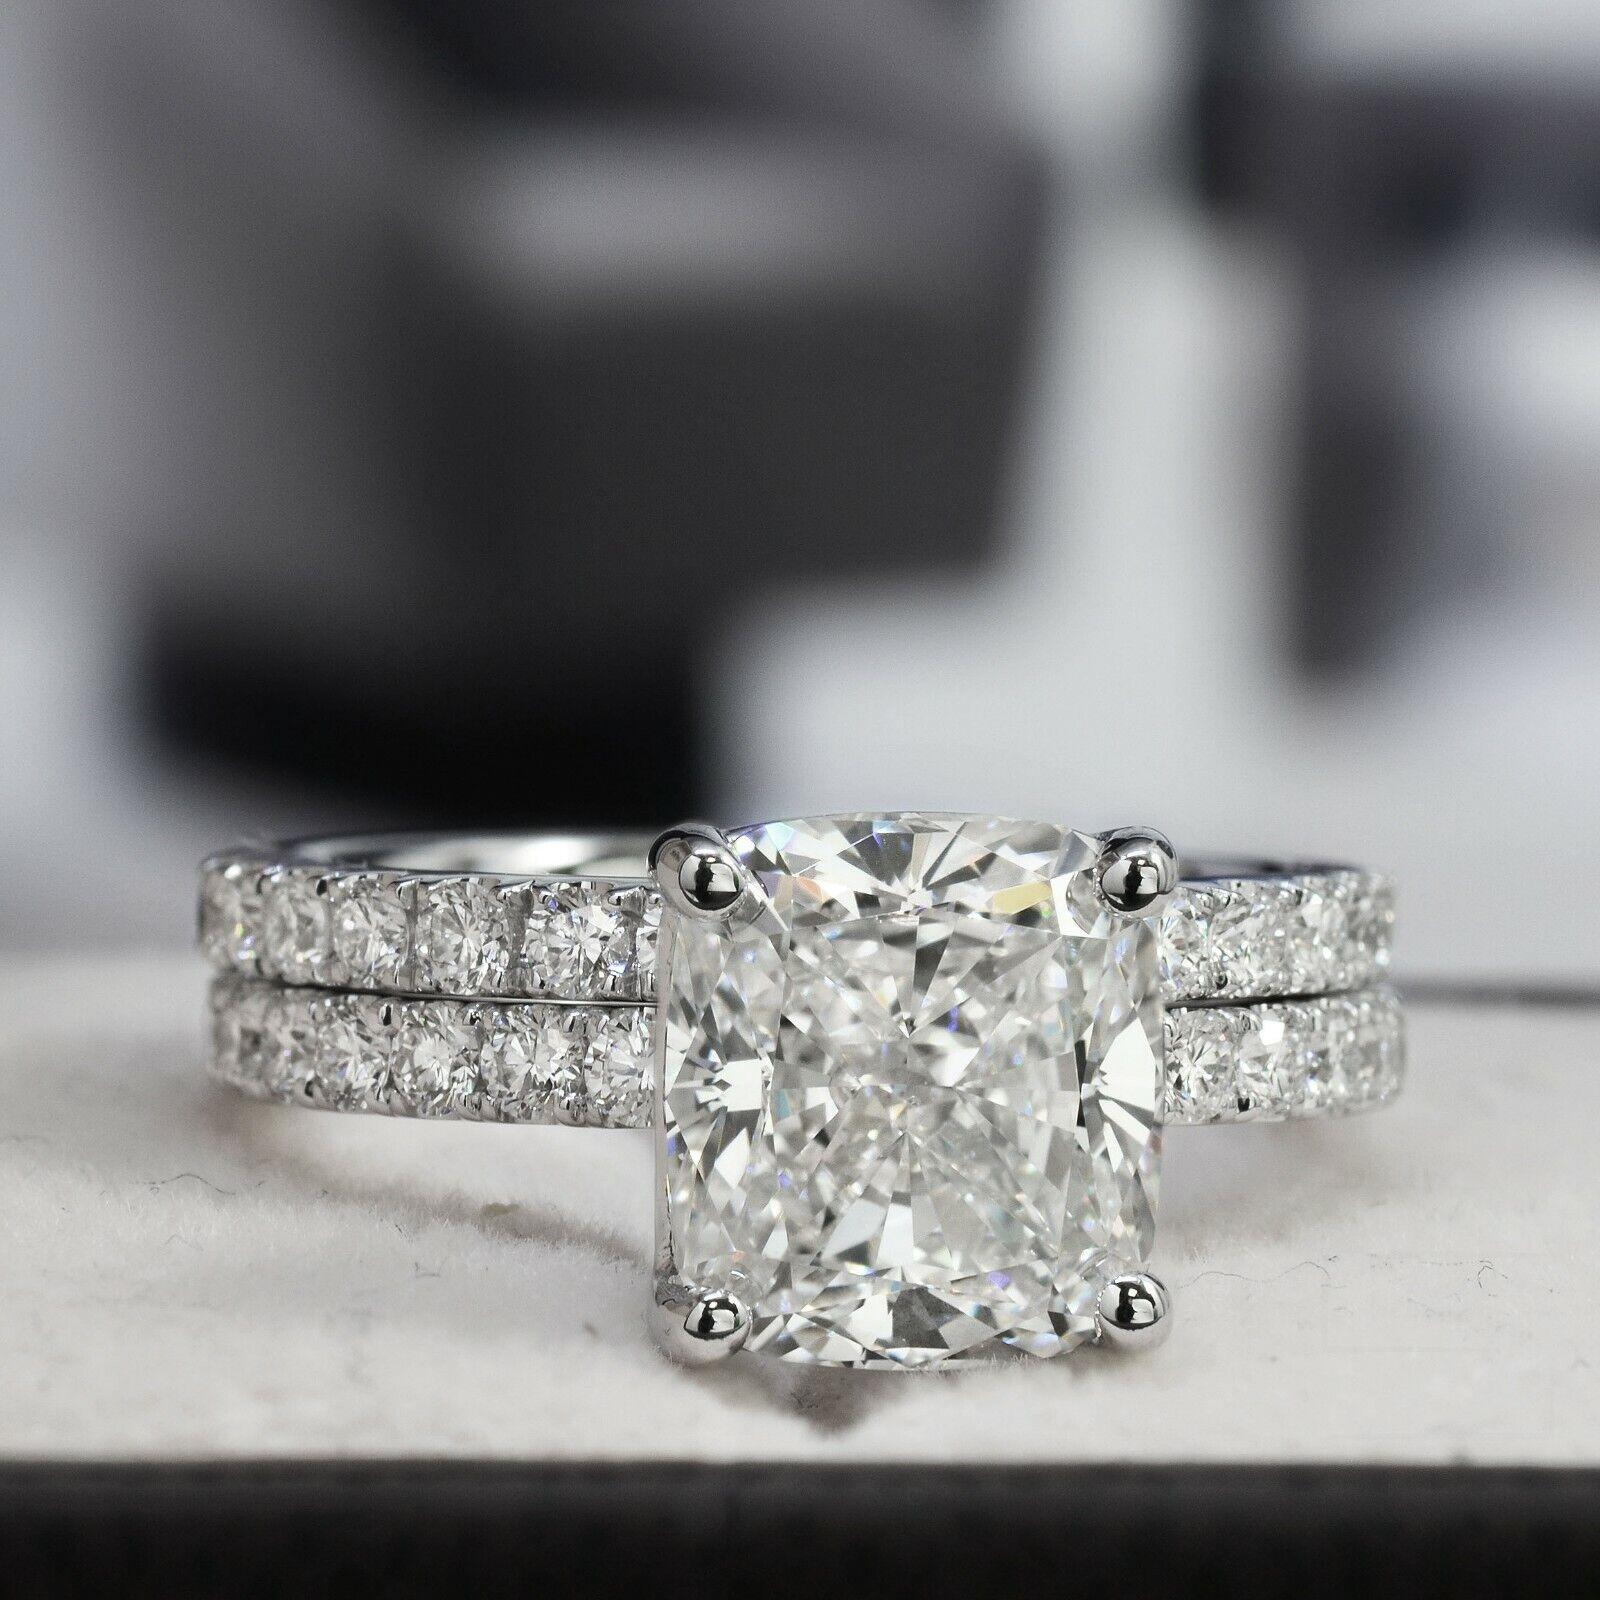 Dazzling 2.10 Ct. Cushion Cut Diamond Engagement Ring Bridal Set GIA Certified 4